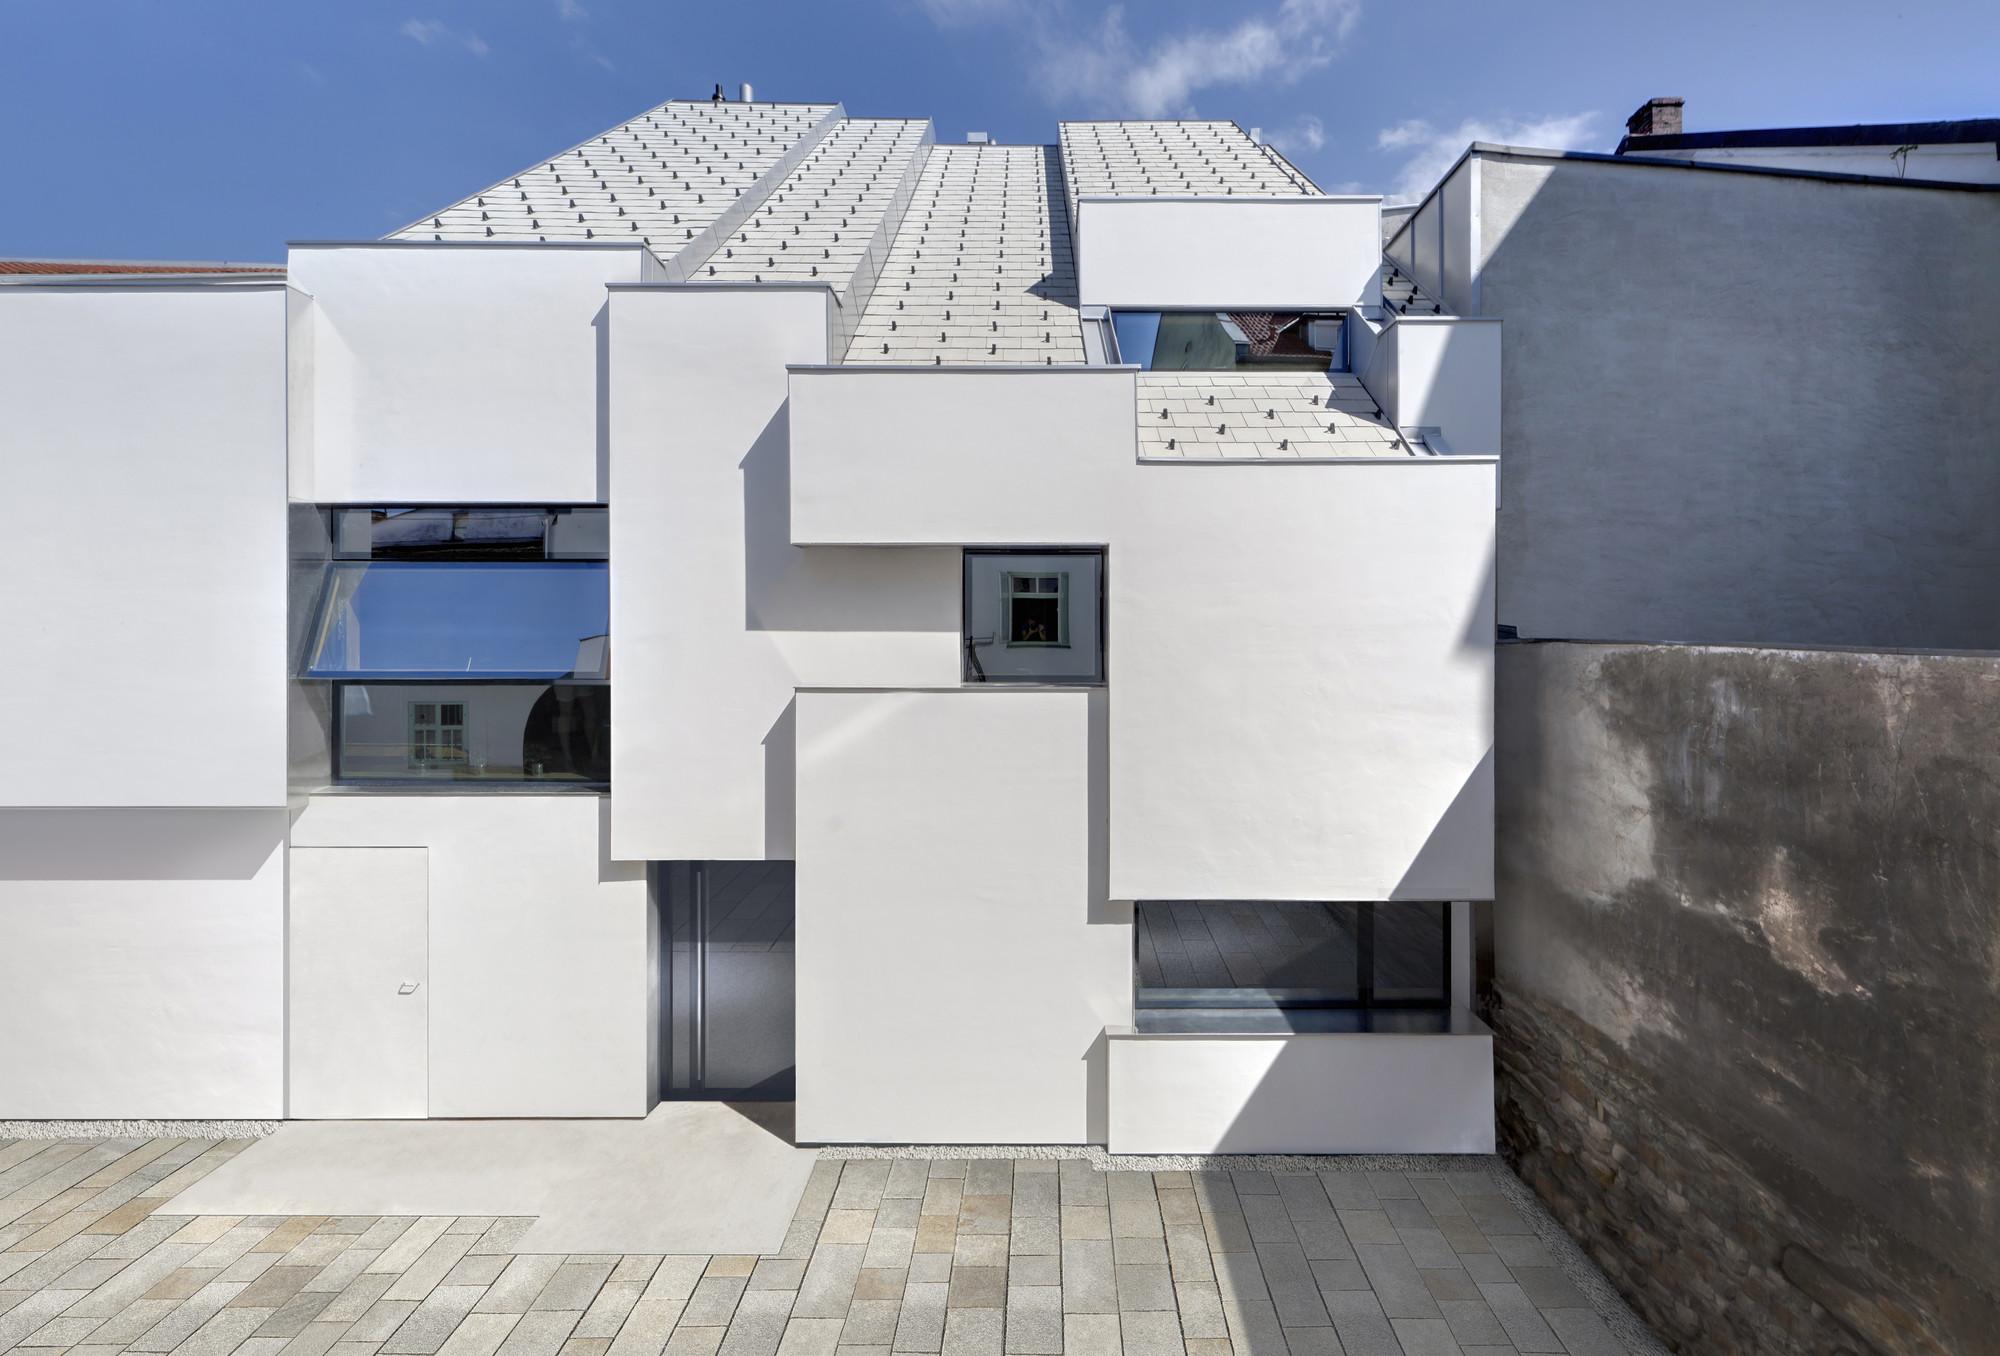 Penzkoferhaus peter haimerl architektur archdaily for Architektur 4 1